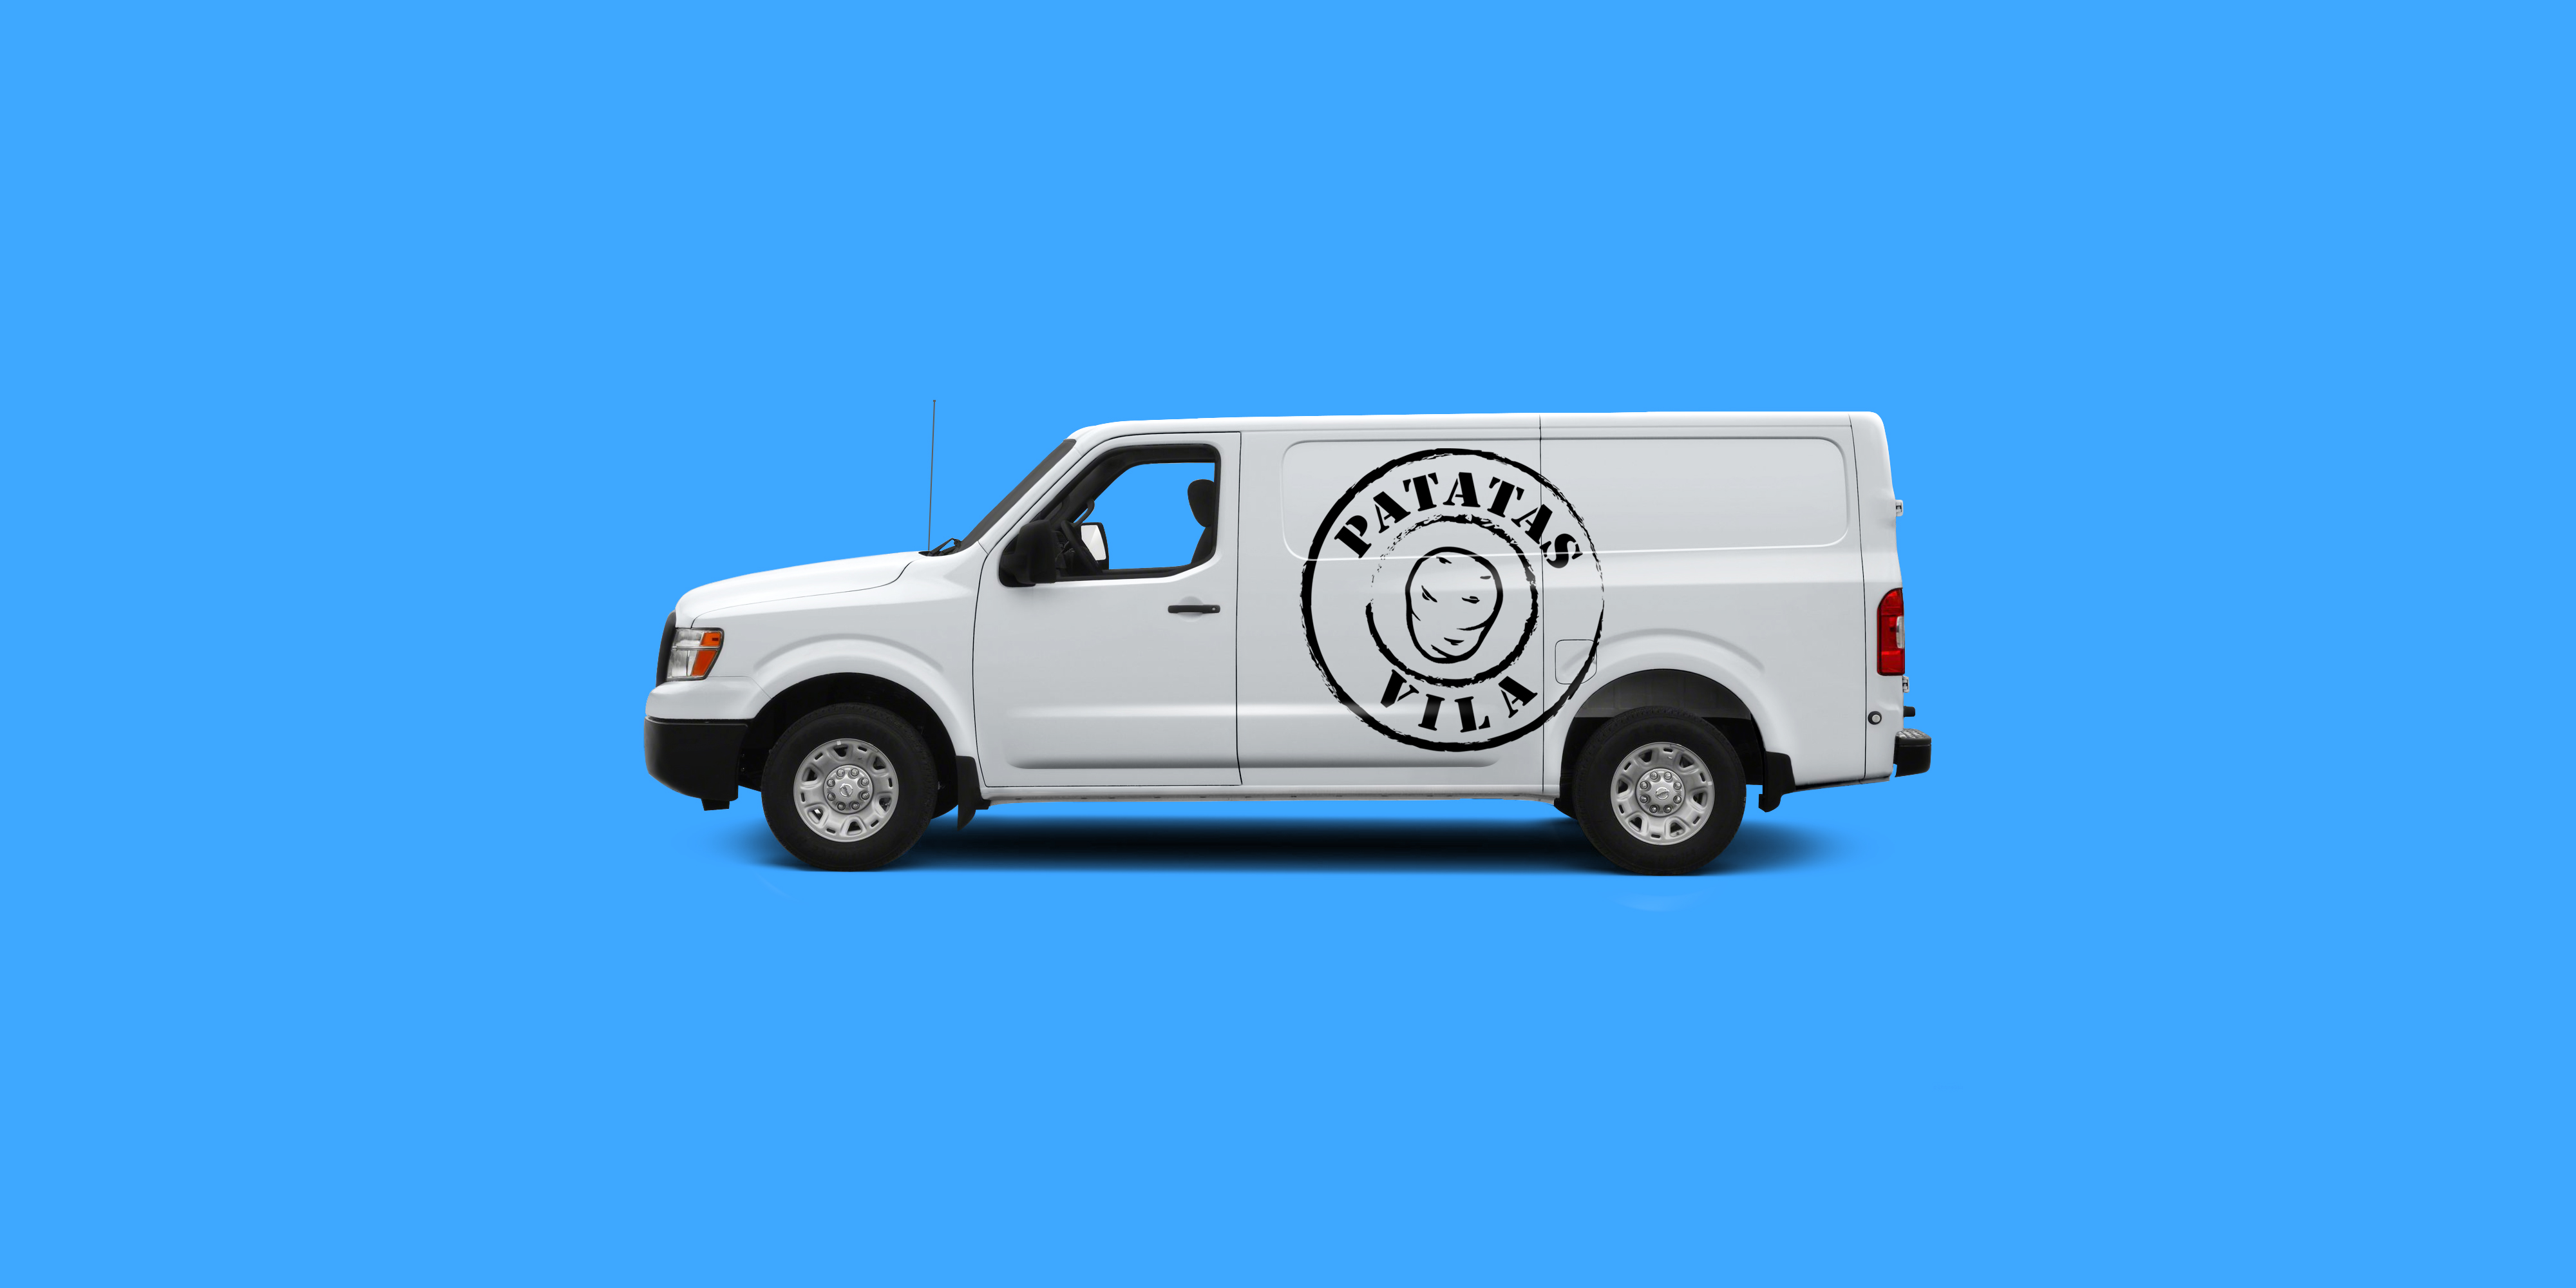 Company's Van